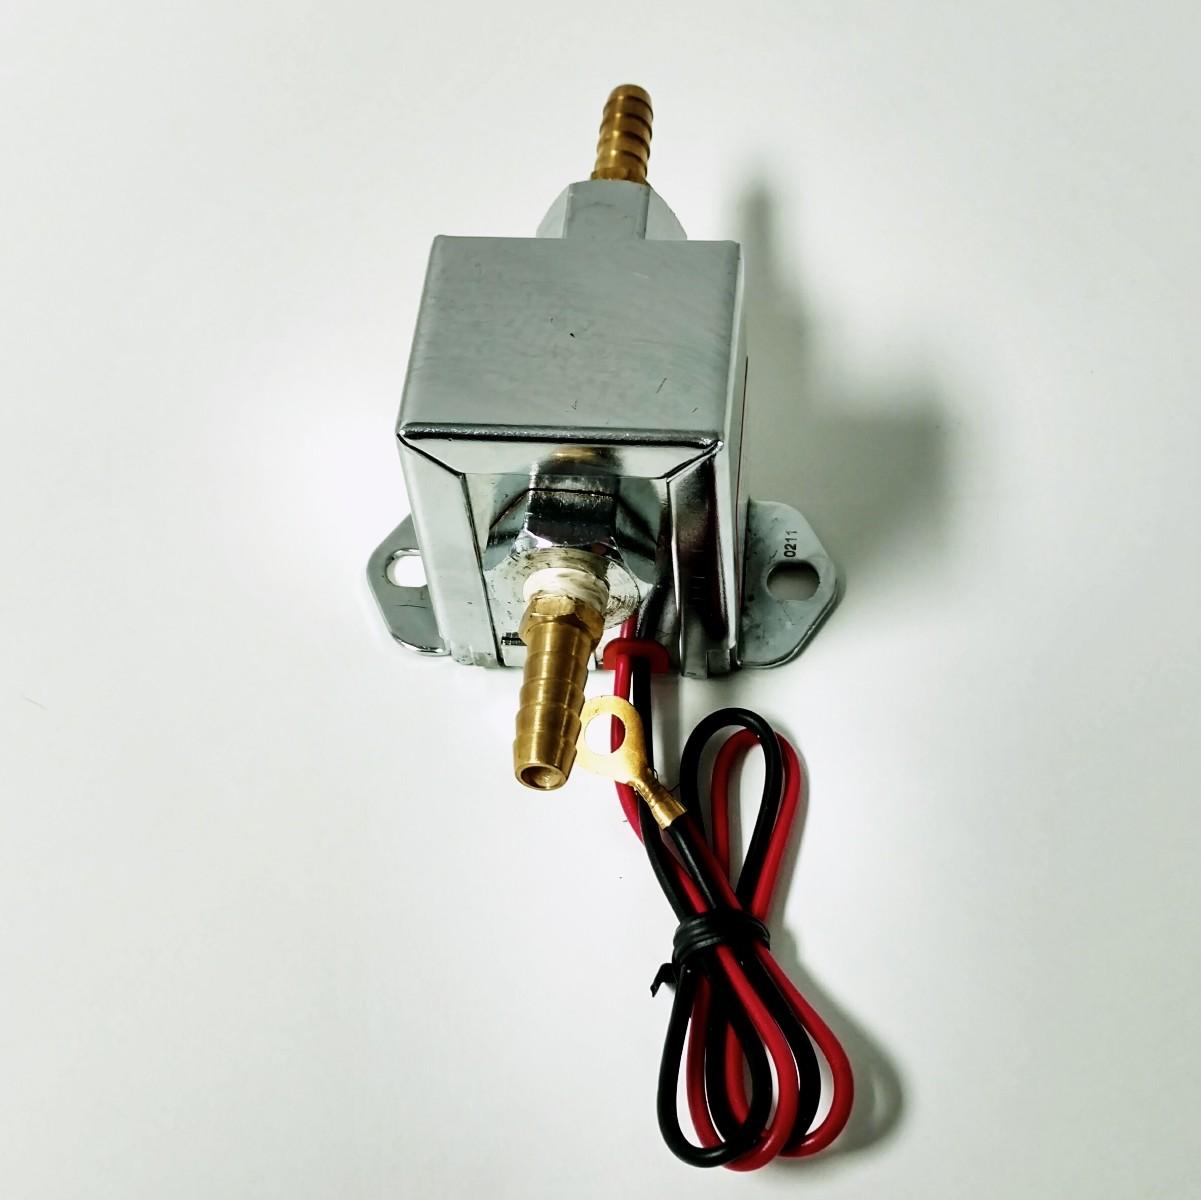 Street Rod Fuel Pump : Universal chrome square electric fuel pump psi hot rat